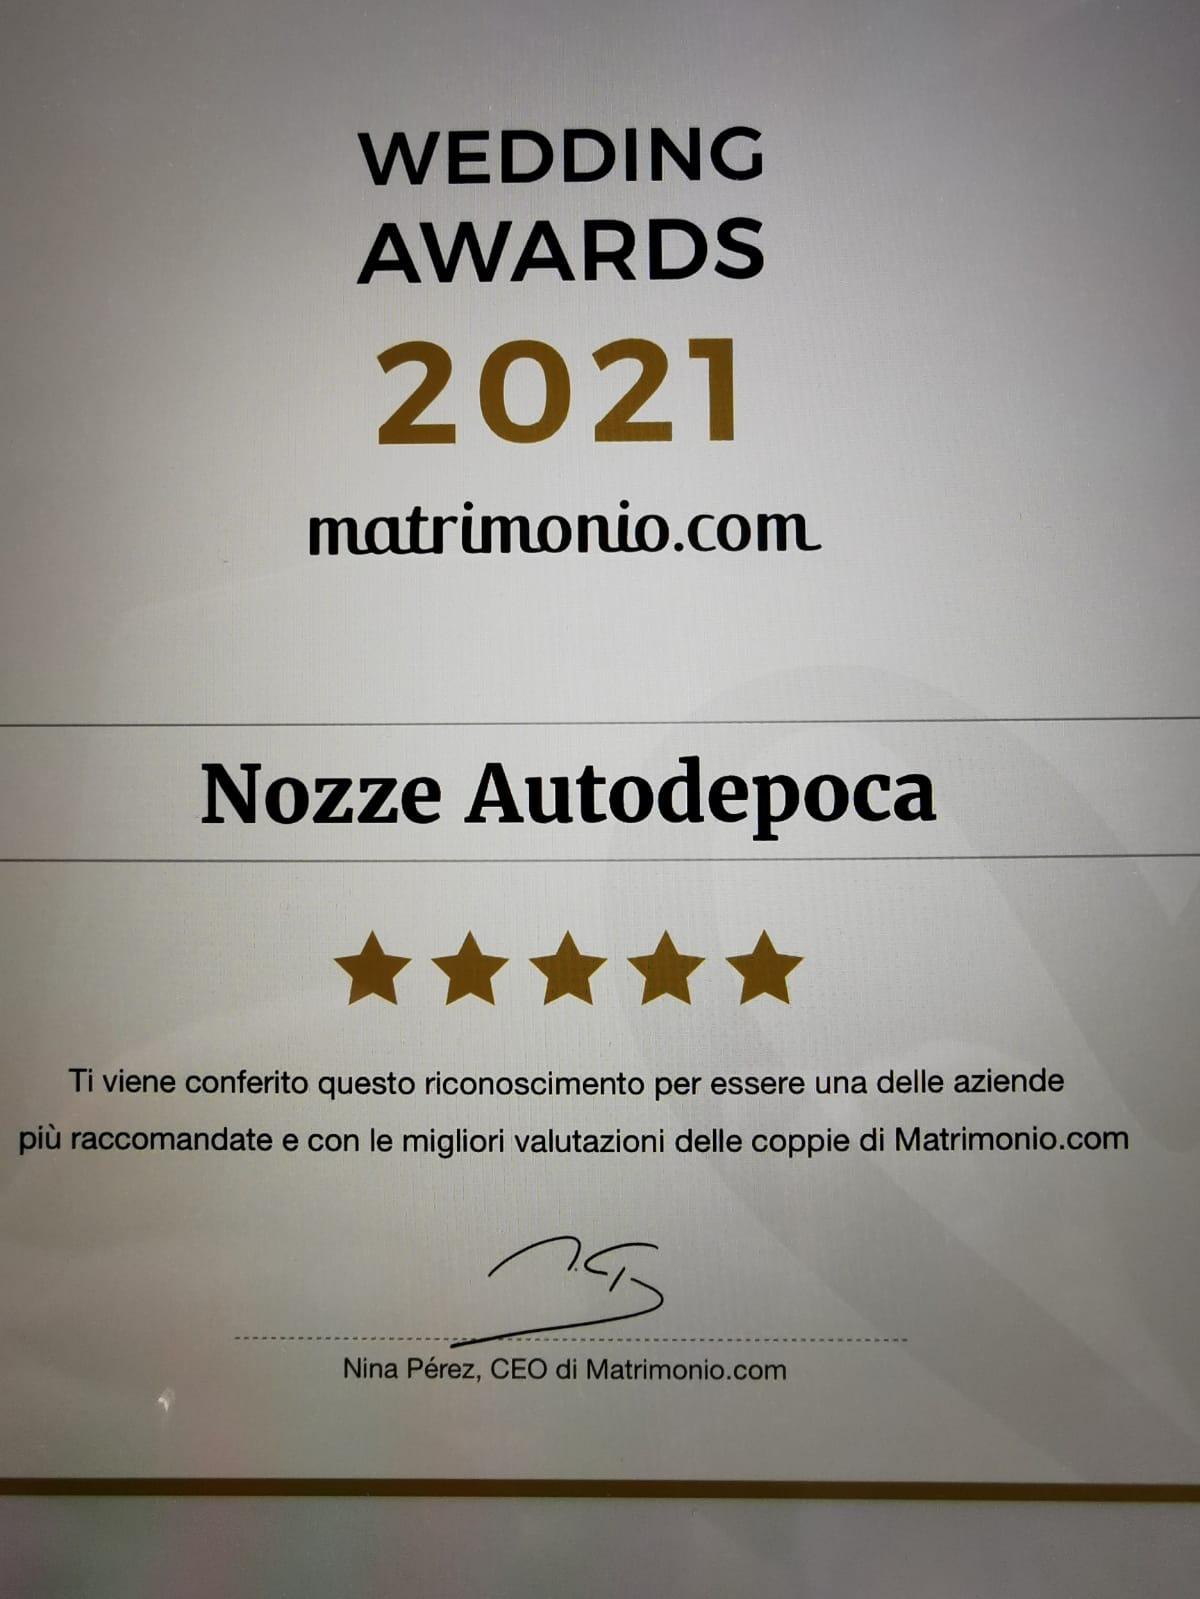 Wedding award 2021 matrimonio.com - Noleggio auto matrimoni - Noleggio Auto matrimoni - nozze auto - auto matrimonio Roma